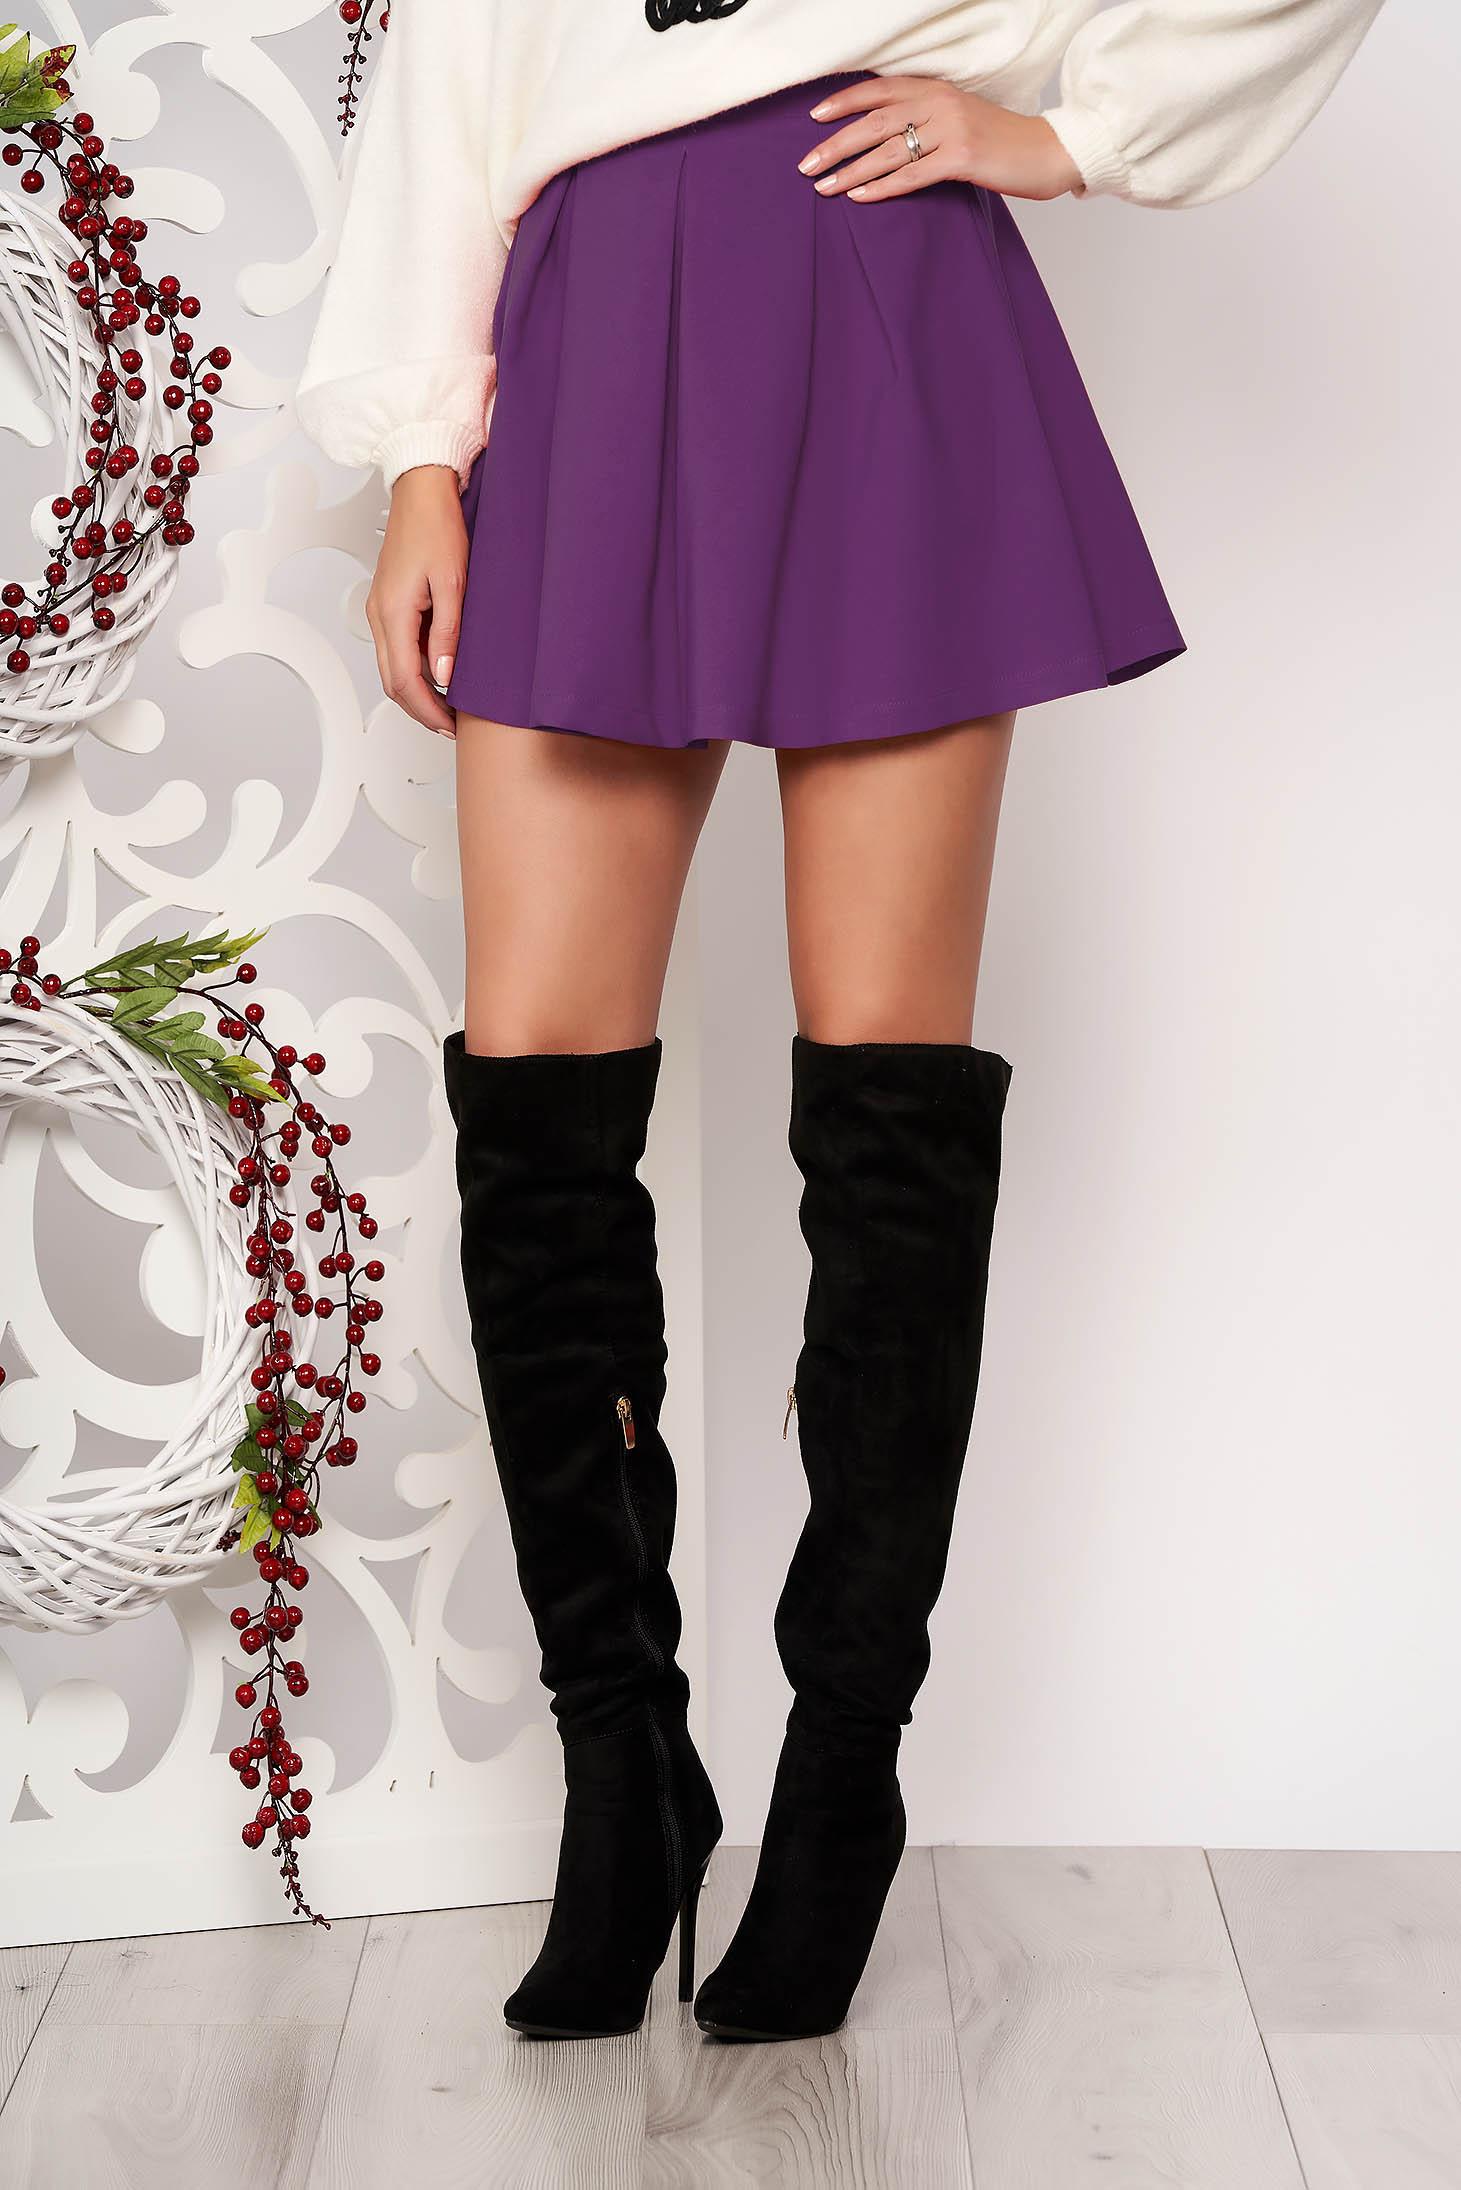 Lila casual cloche skirt slightly elastic fabric medium waist